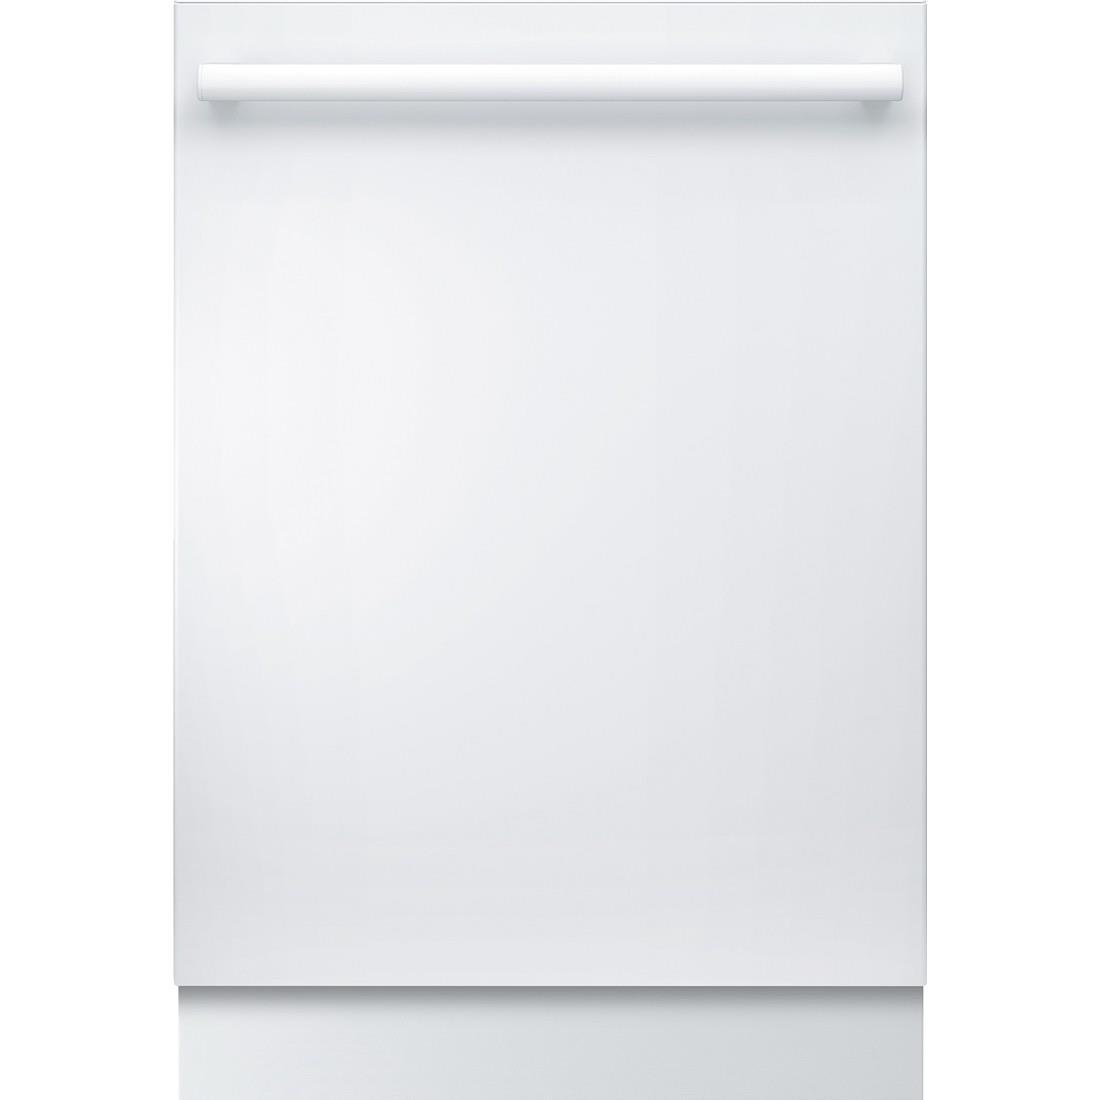 "Bosch Dishwashers 24"" Built-In Tall Tub Dishwasher - Item Number: SHX5AV52UC"